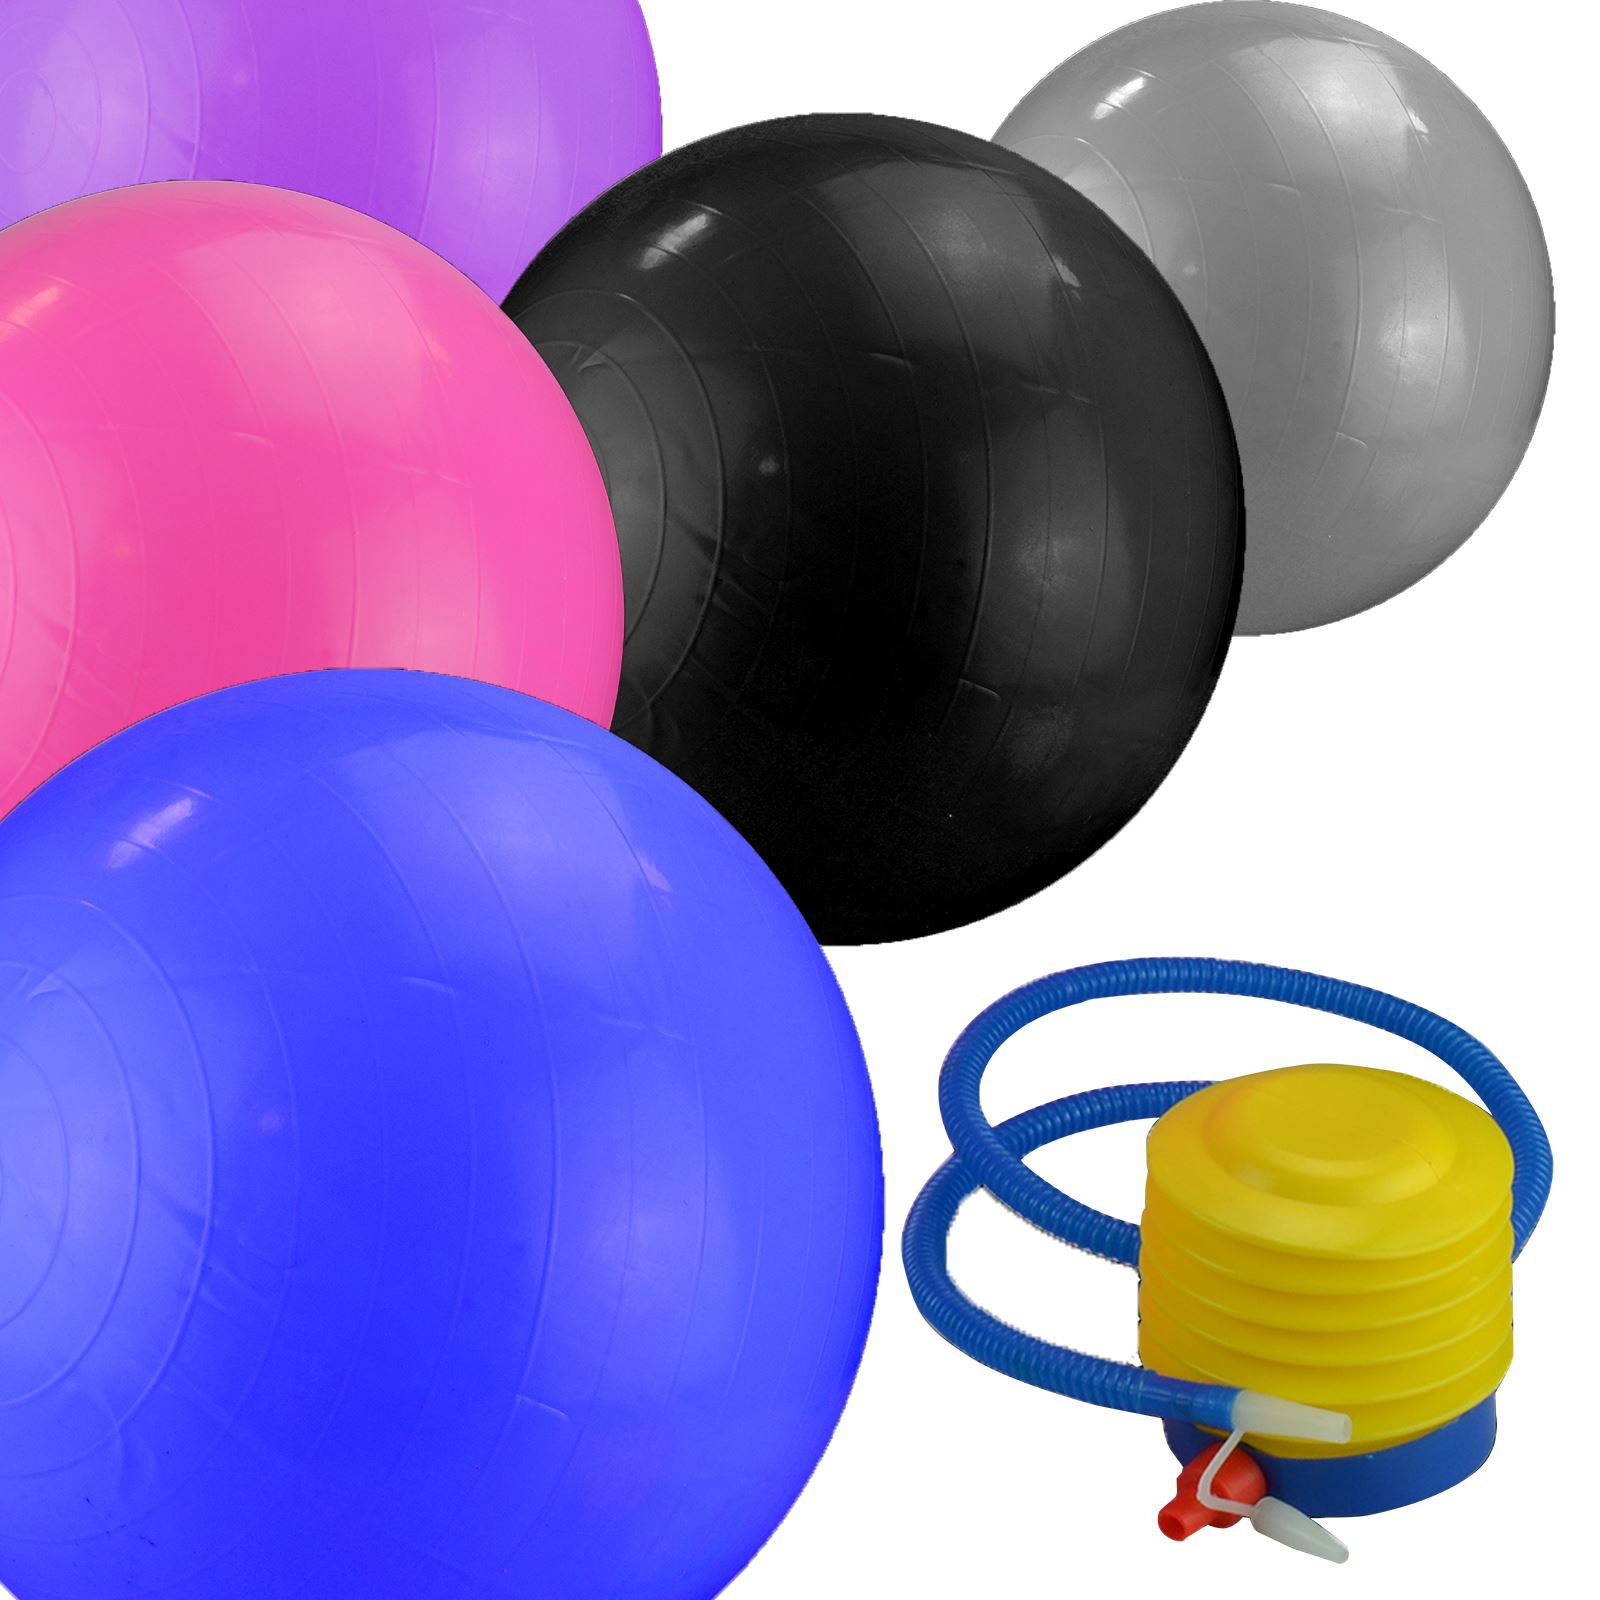 Balance Ball Exercises For Pregnancy: 65cm Yoga Exercise Gym Swiss Ball Pregnancy Fitness Anti